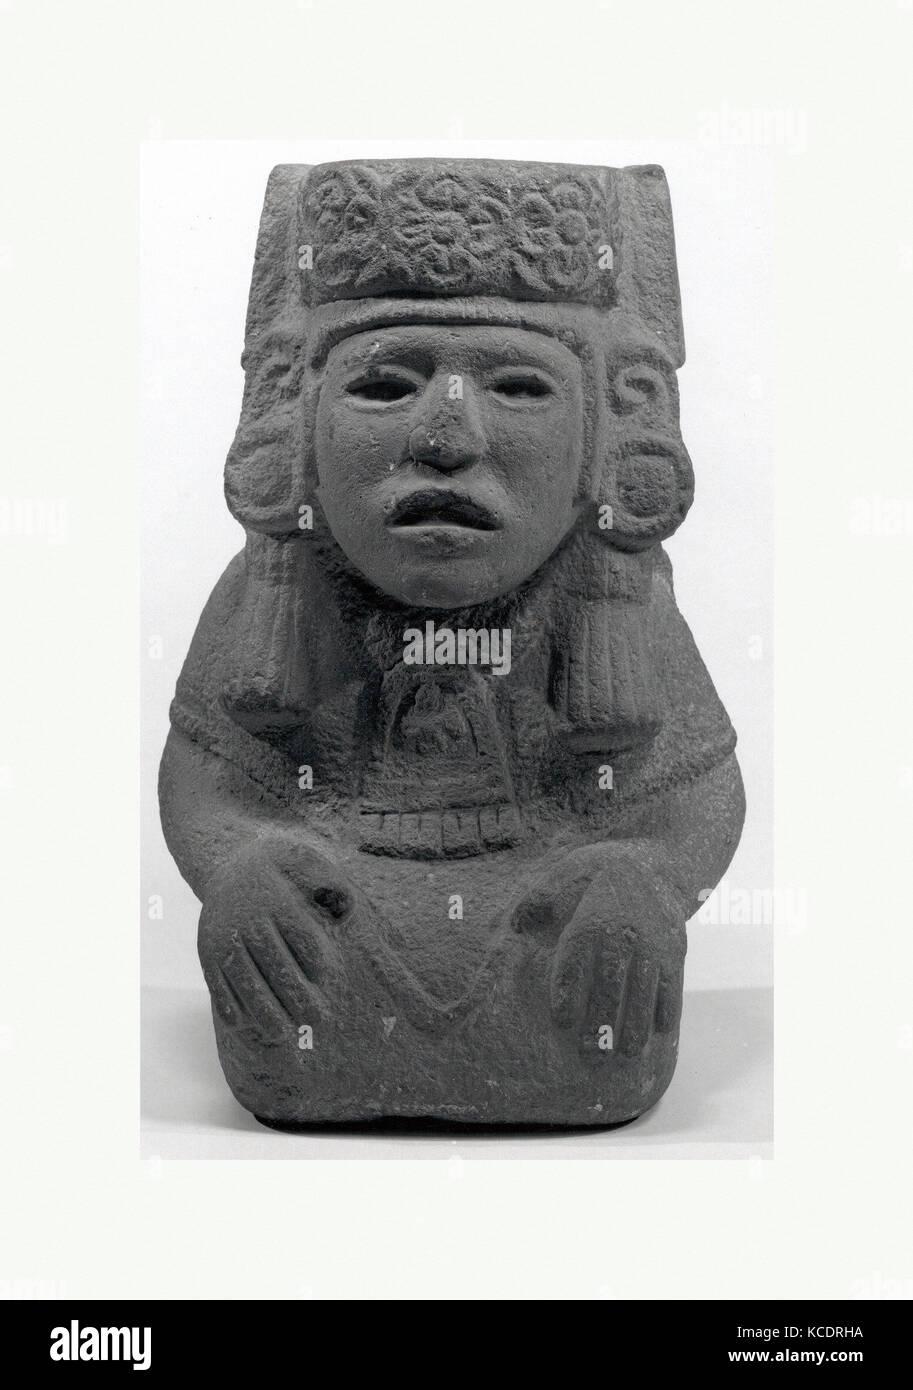 Seated Female Deity, 15th–early 16th century, Mexico, Mesoamerica, Aztec, Stone, H. 12 1/4 x W . 7 1/2 x D. 5 1/2 - Stock Image